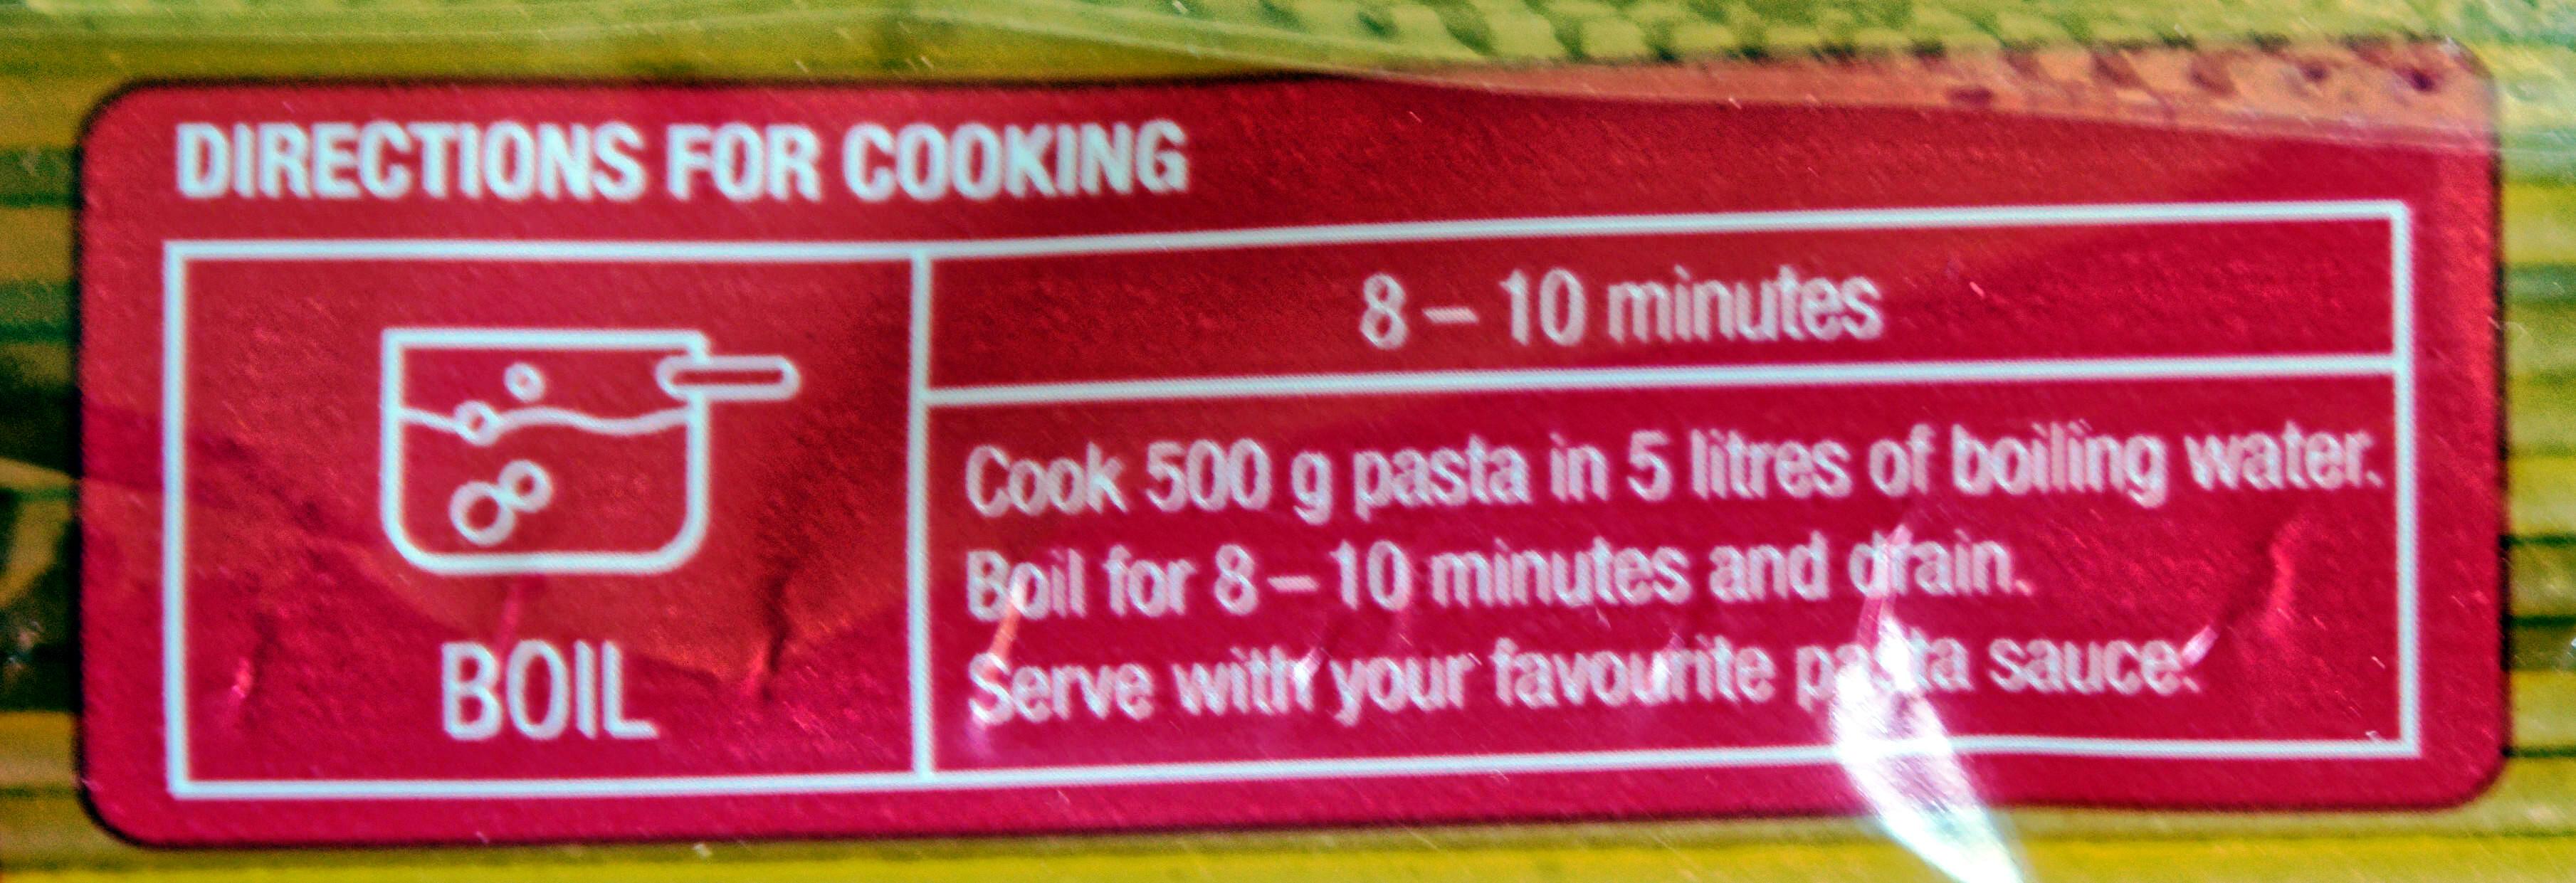 Noodles-3.jpeg